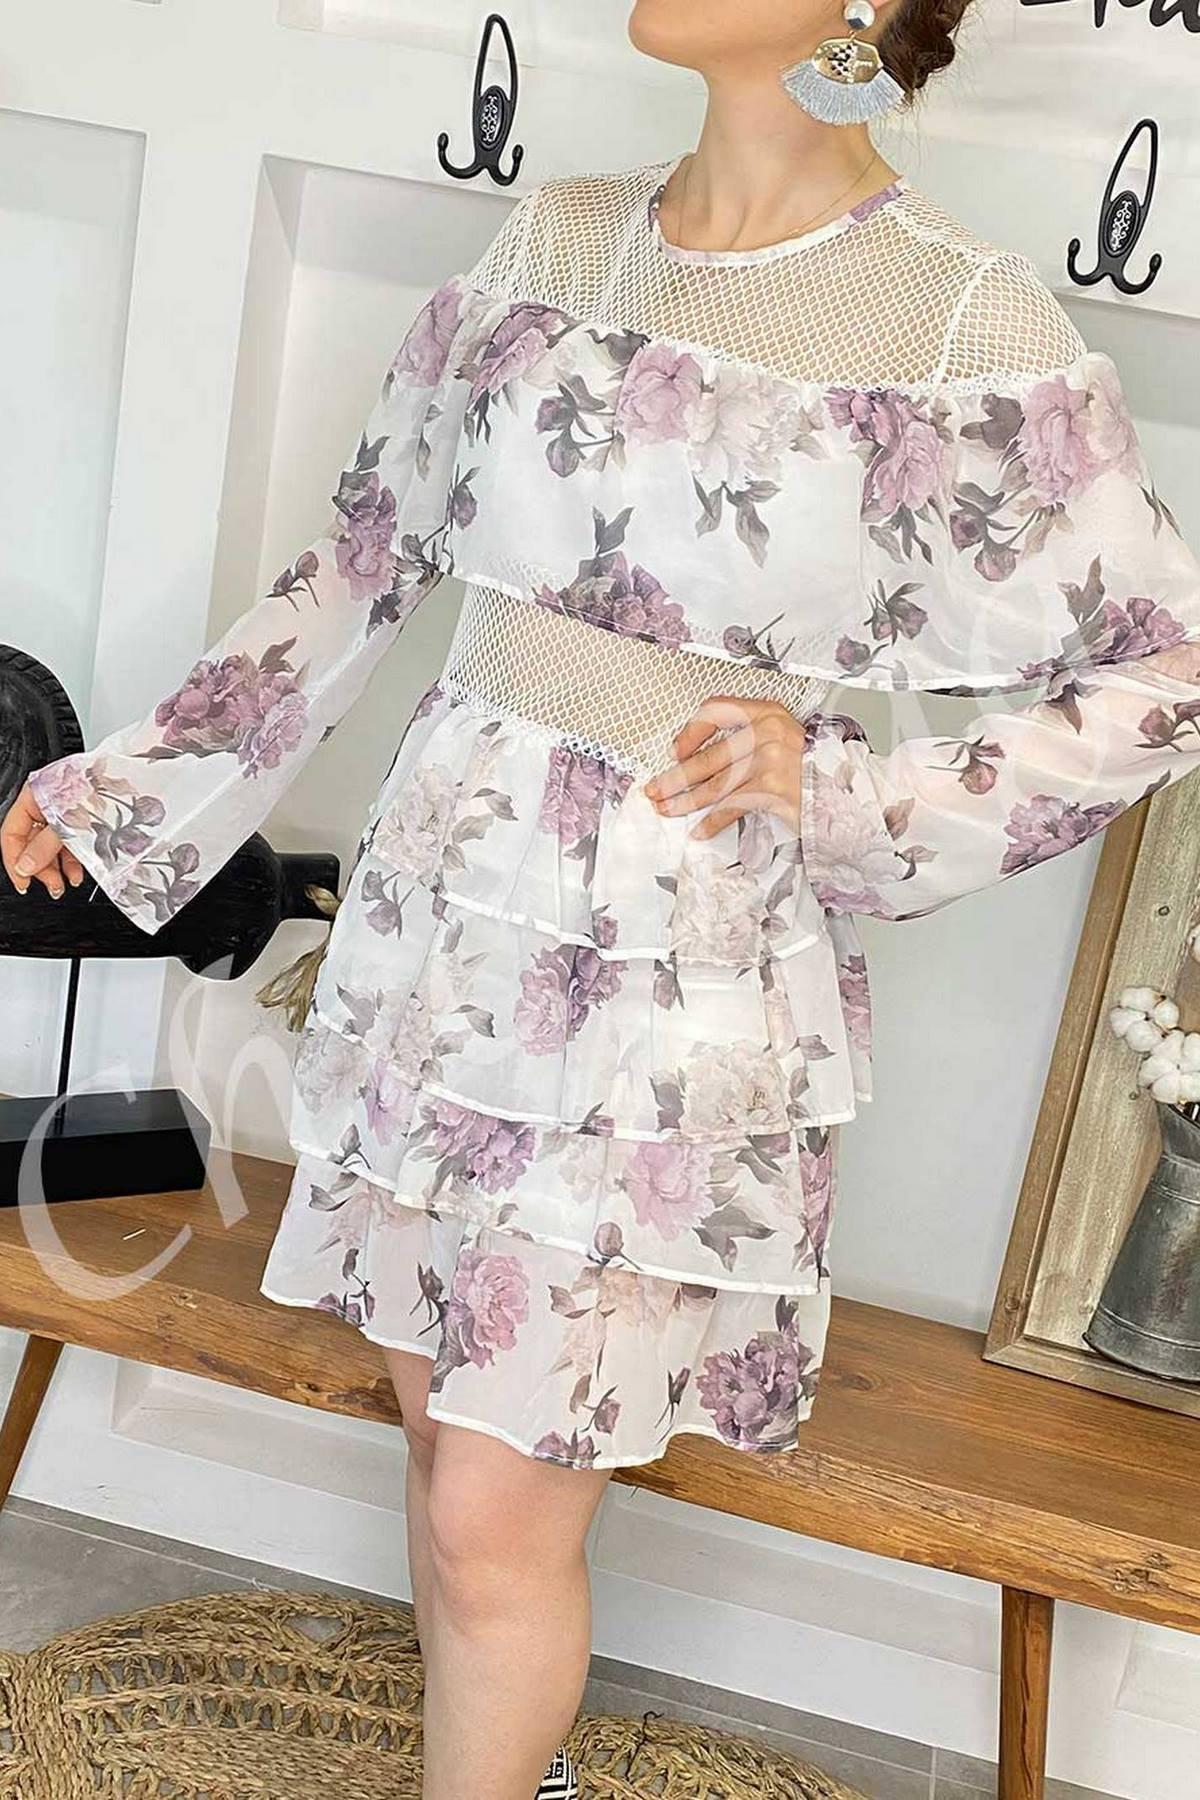 https://resim.chicbag.com.tr/p000021/byz/questo-omuz-ustu-ve-beli-fileli-kollari-ve-etegi-katli-sifon-elbise-01ab104f8a8c.